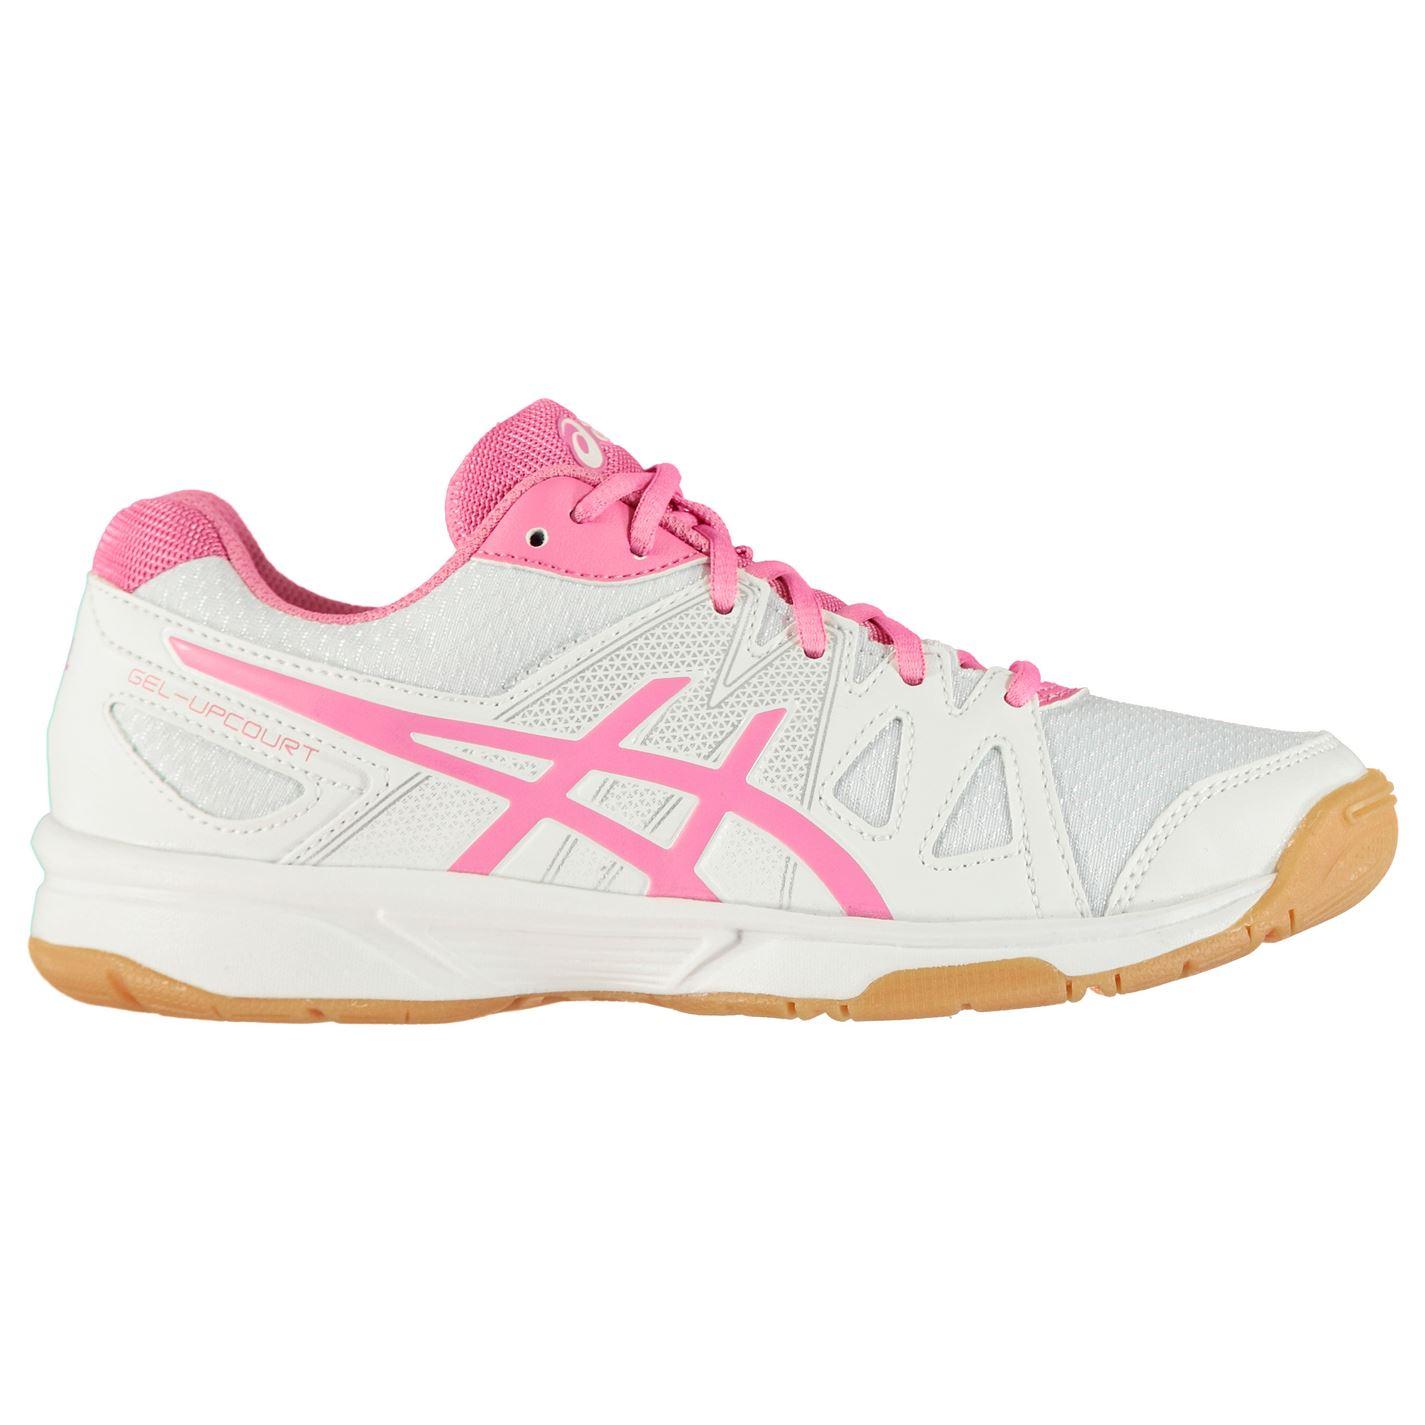 Asics Gel Upcourt Ladies Indoor Court Shoes